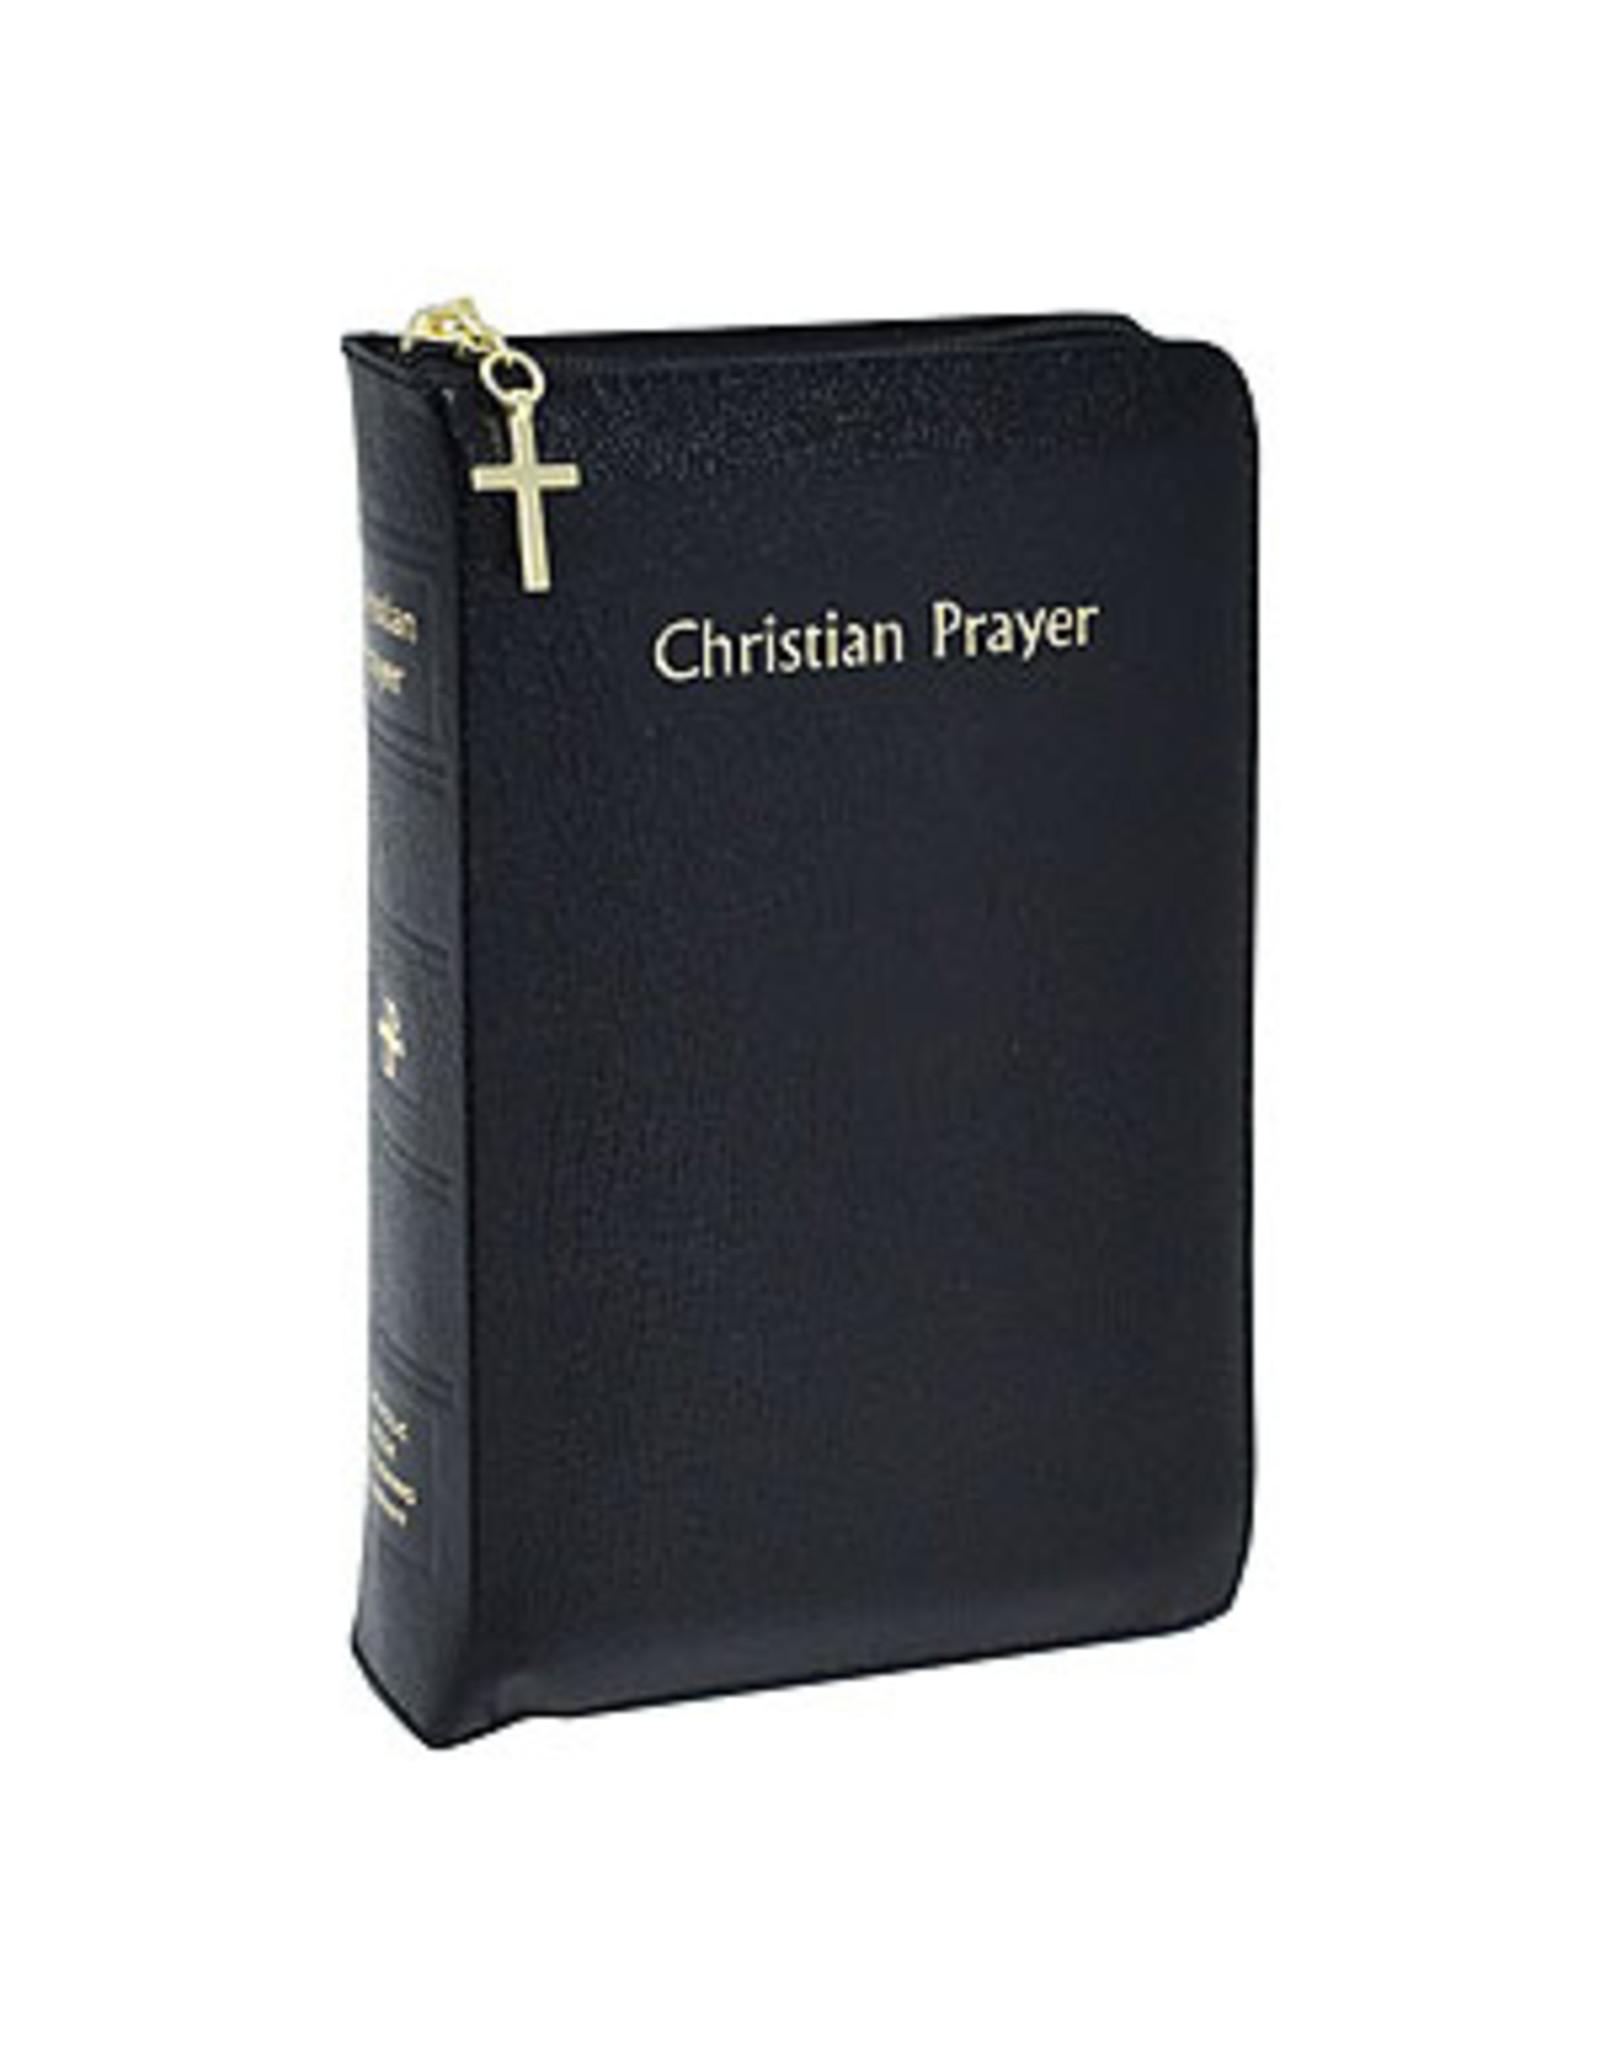 Christian Prayer (Black Leather)